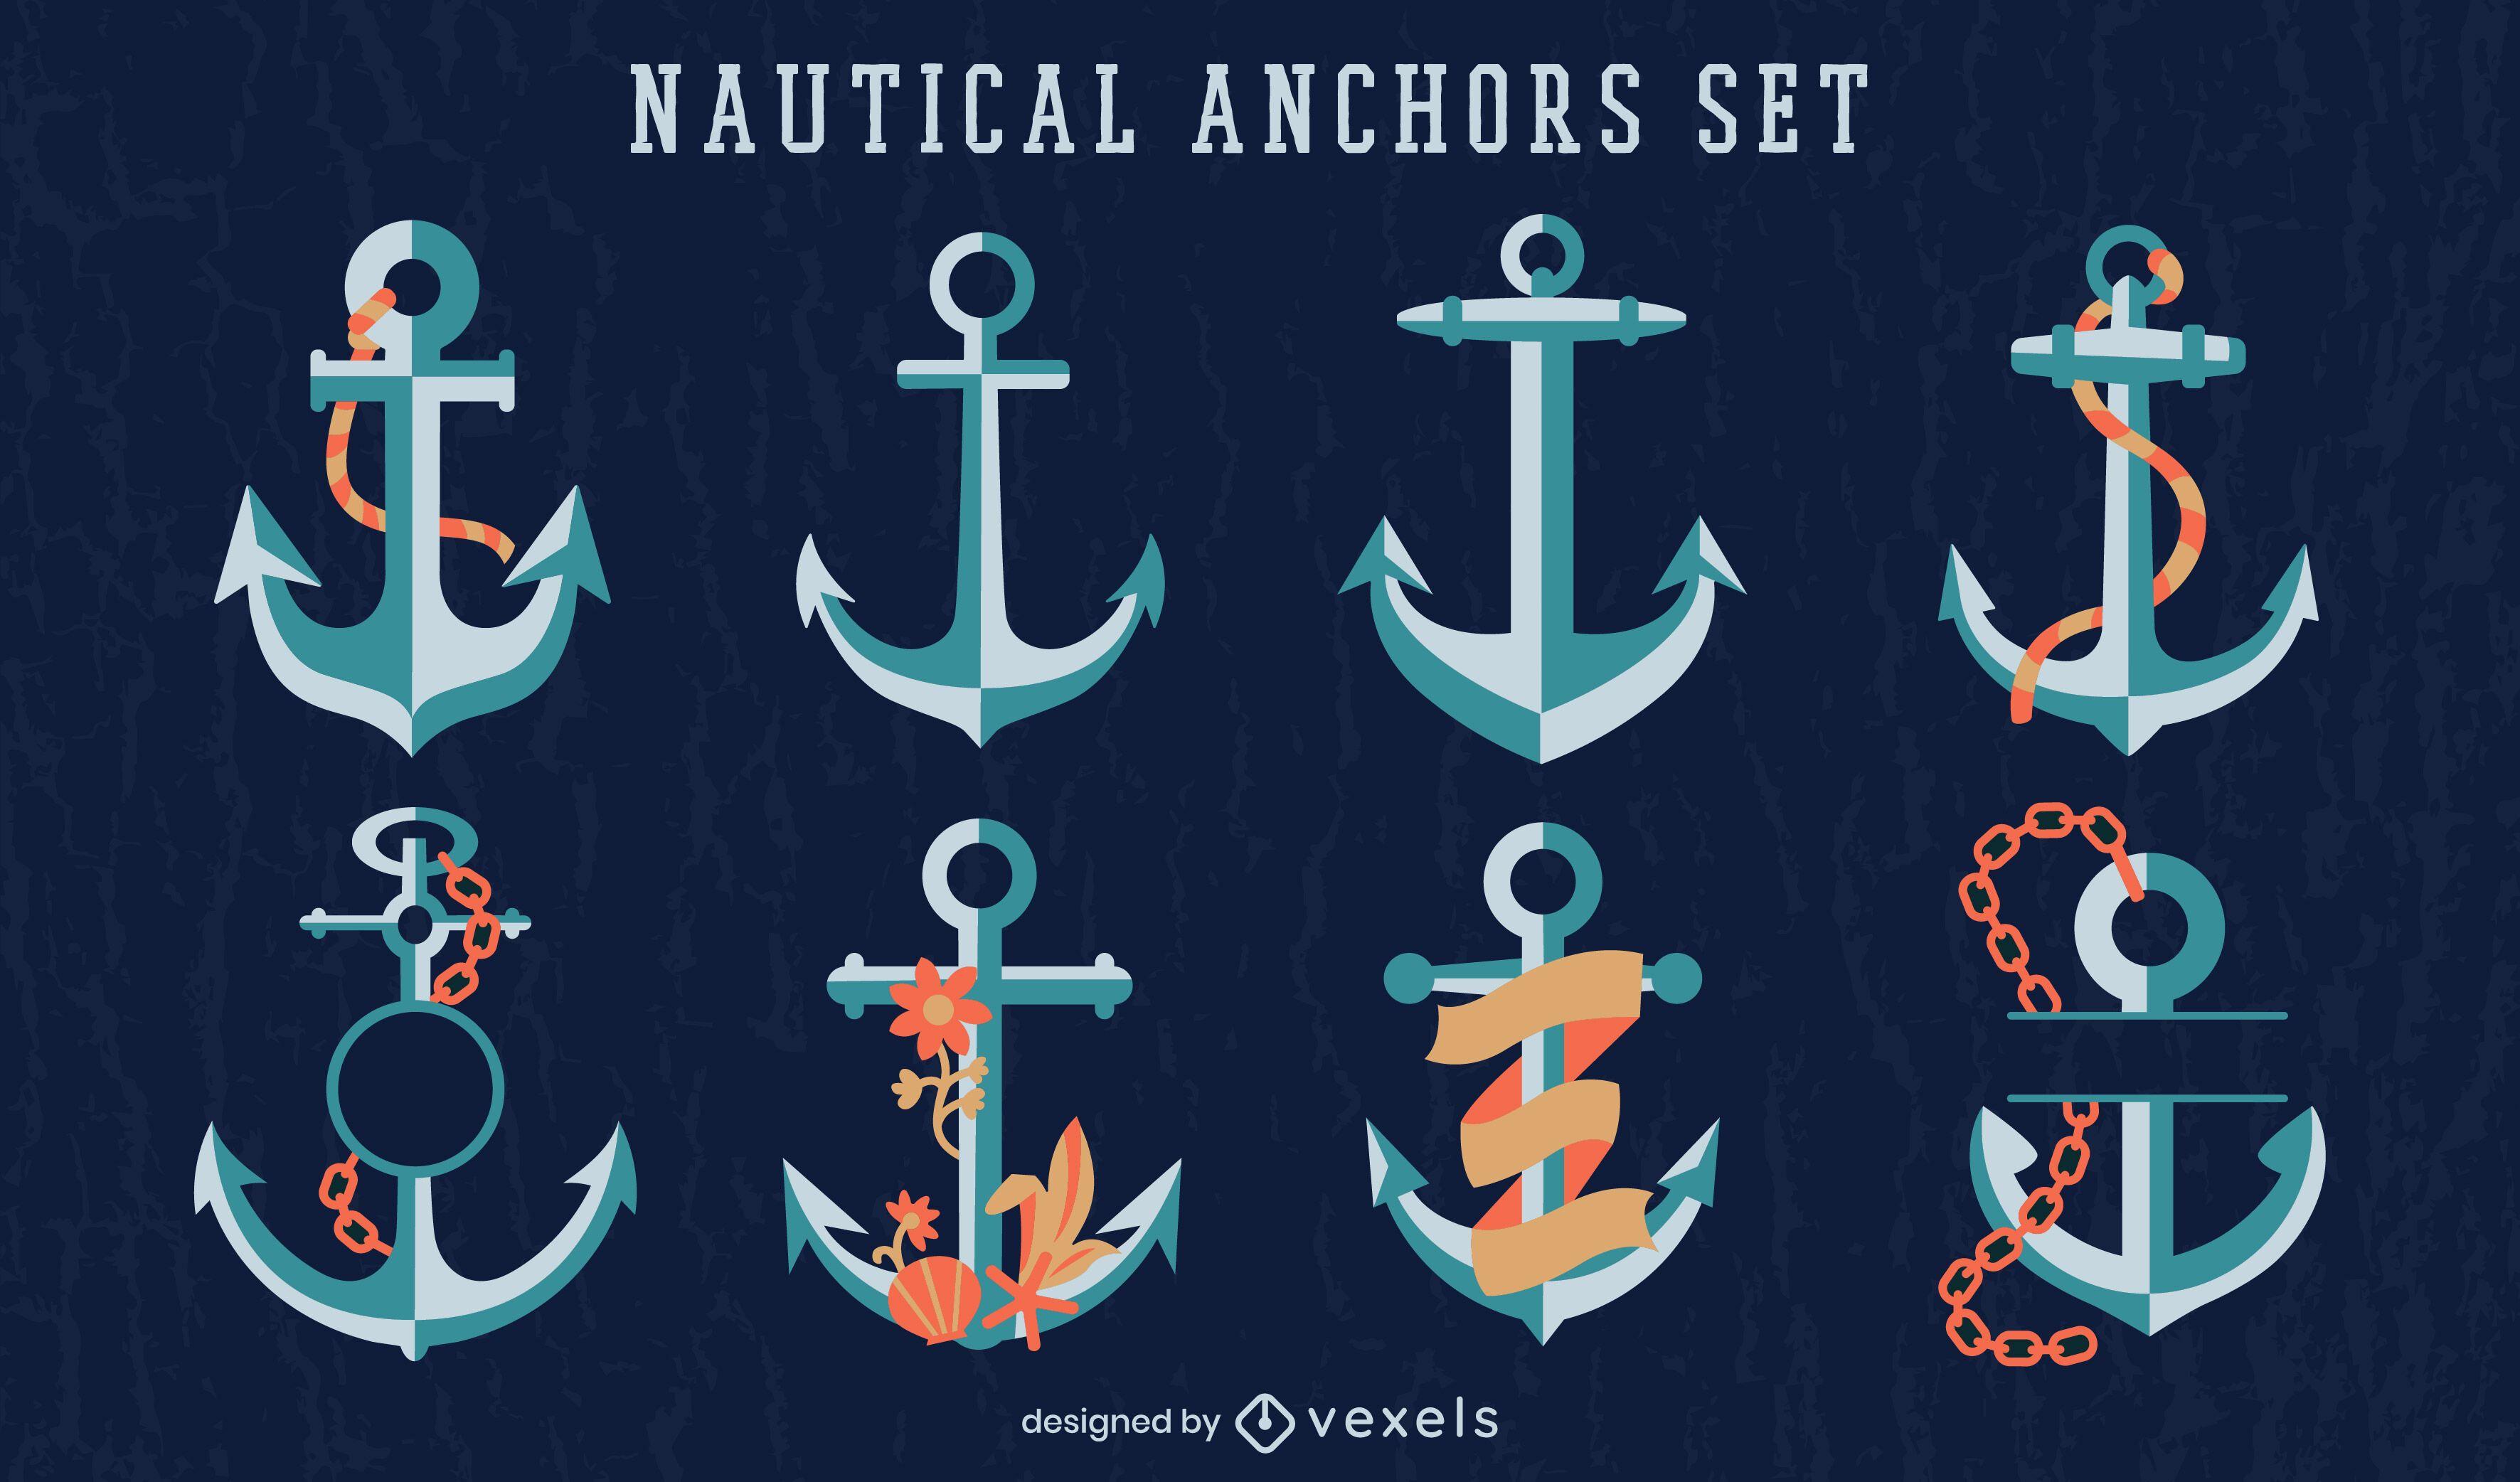 Anchor ship nautical illustration set